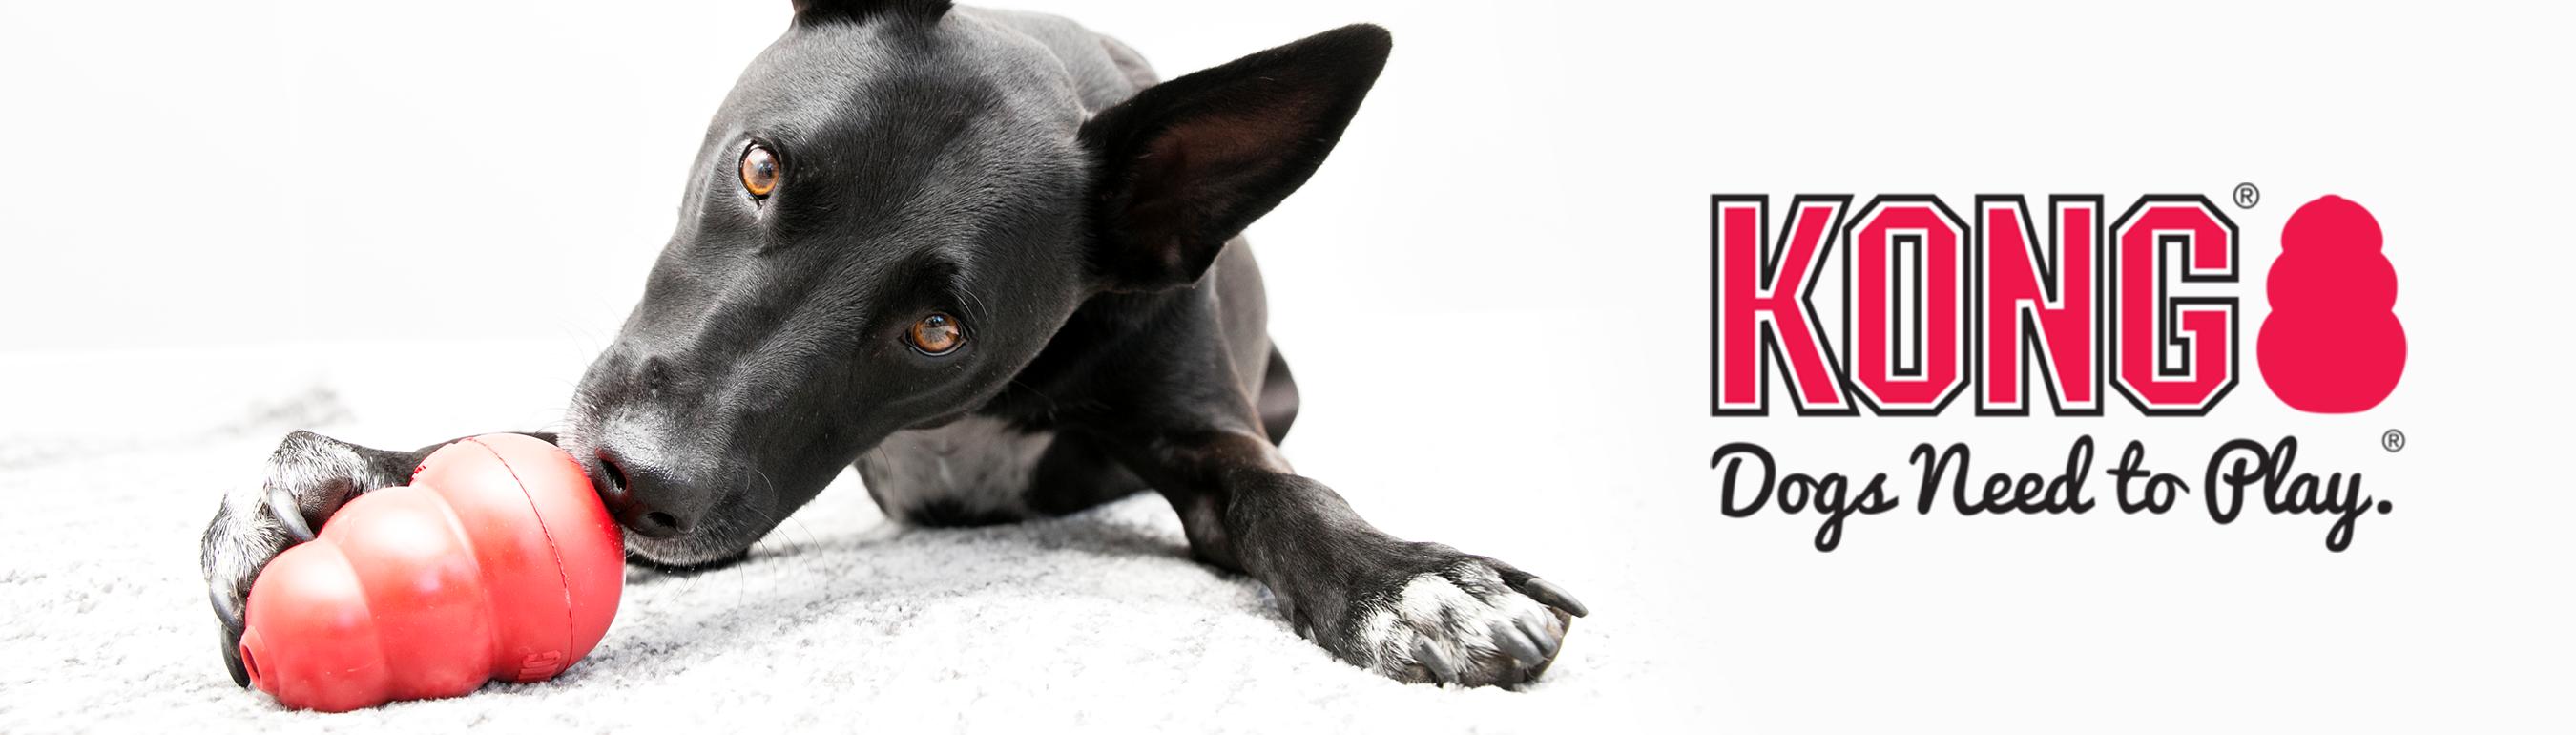 KONG Hundespielzeug günstig online kaufen bei tiierisch.de